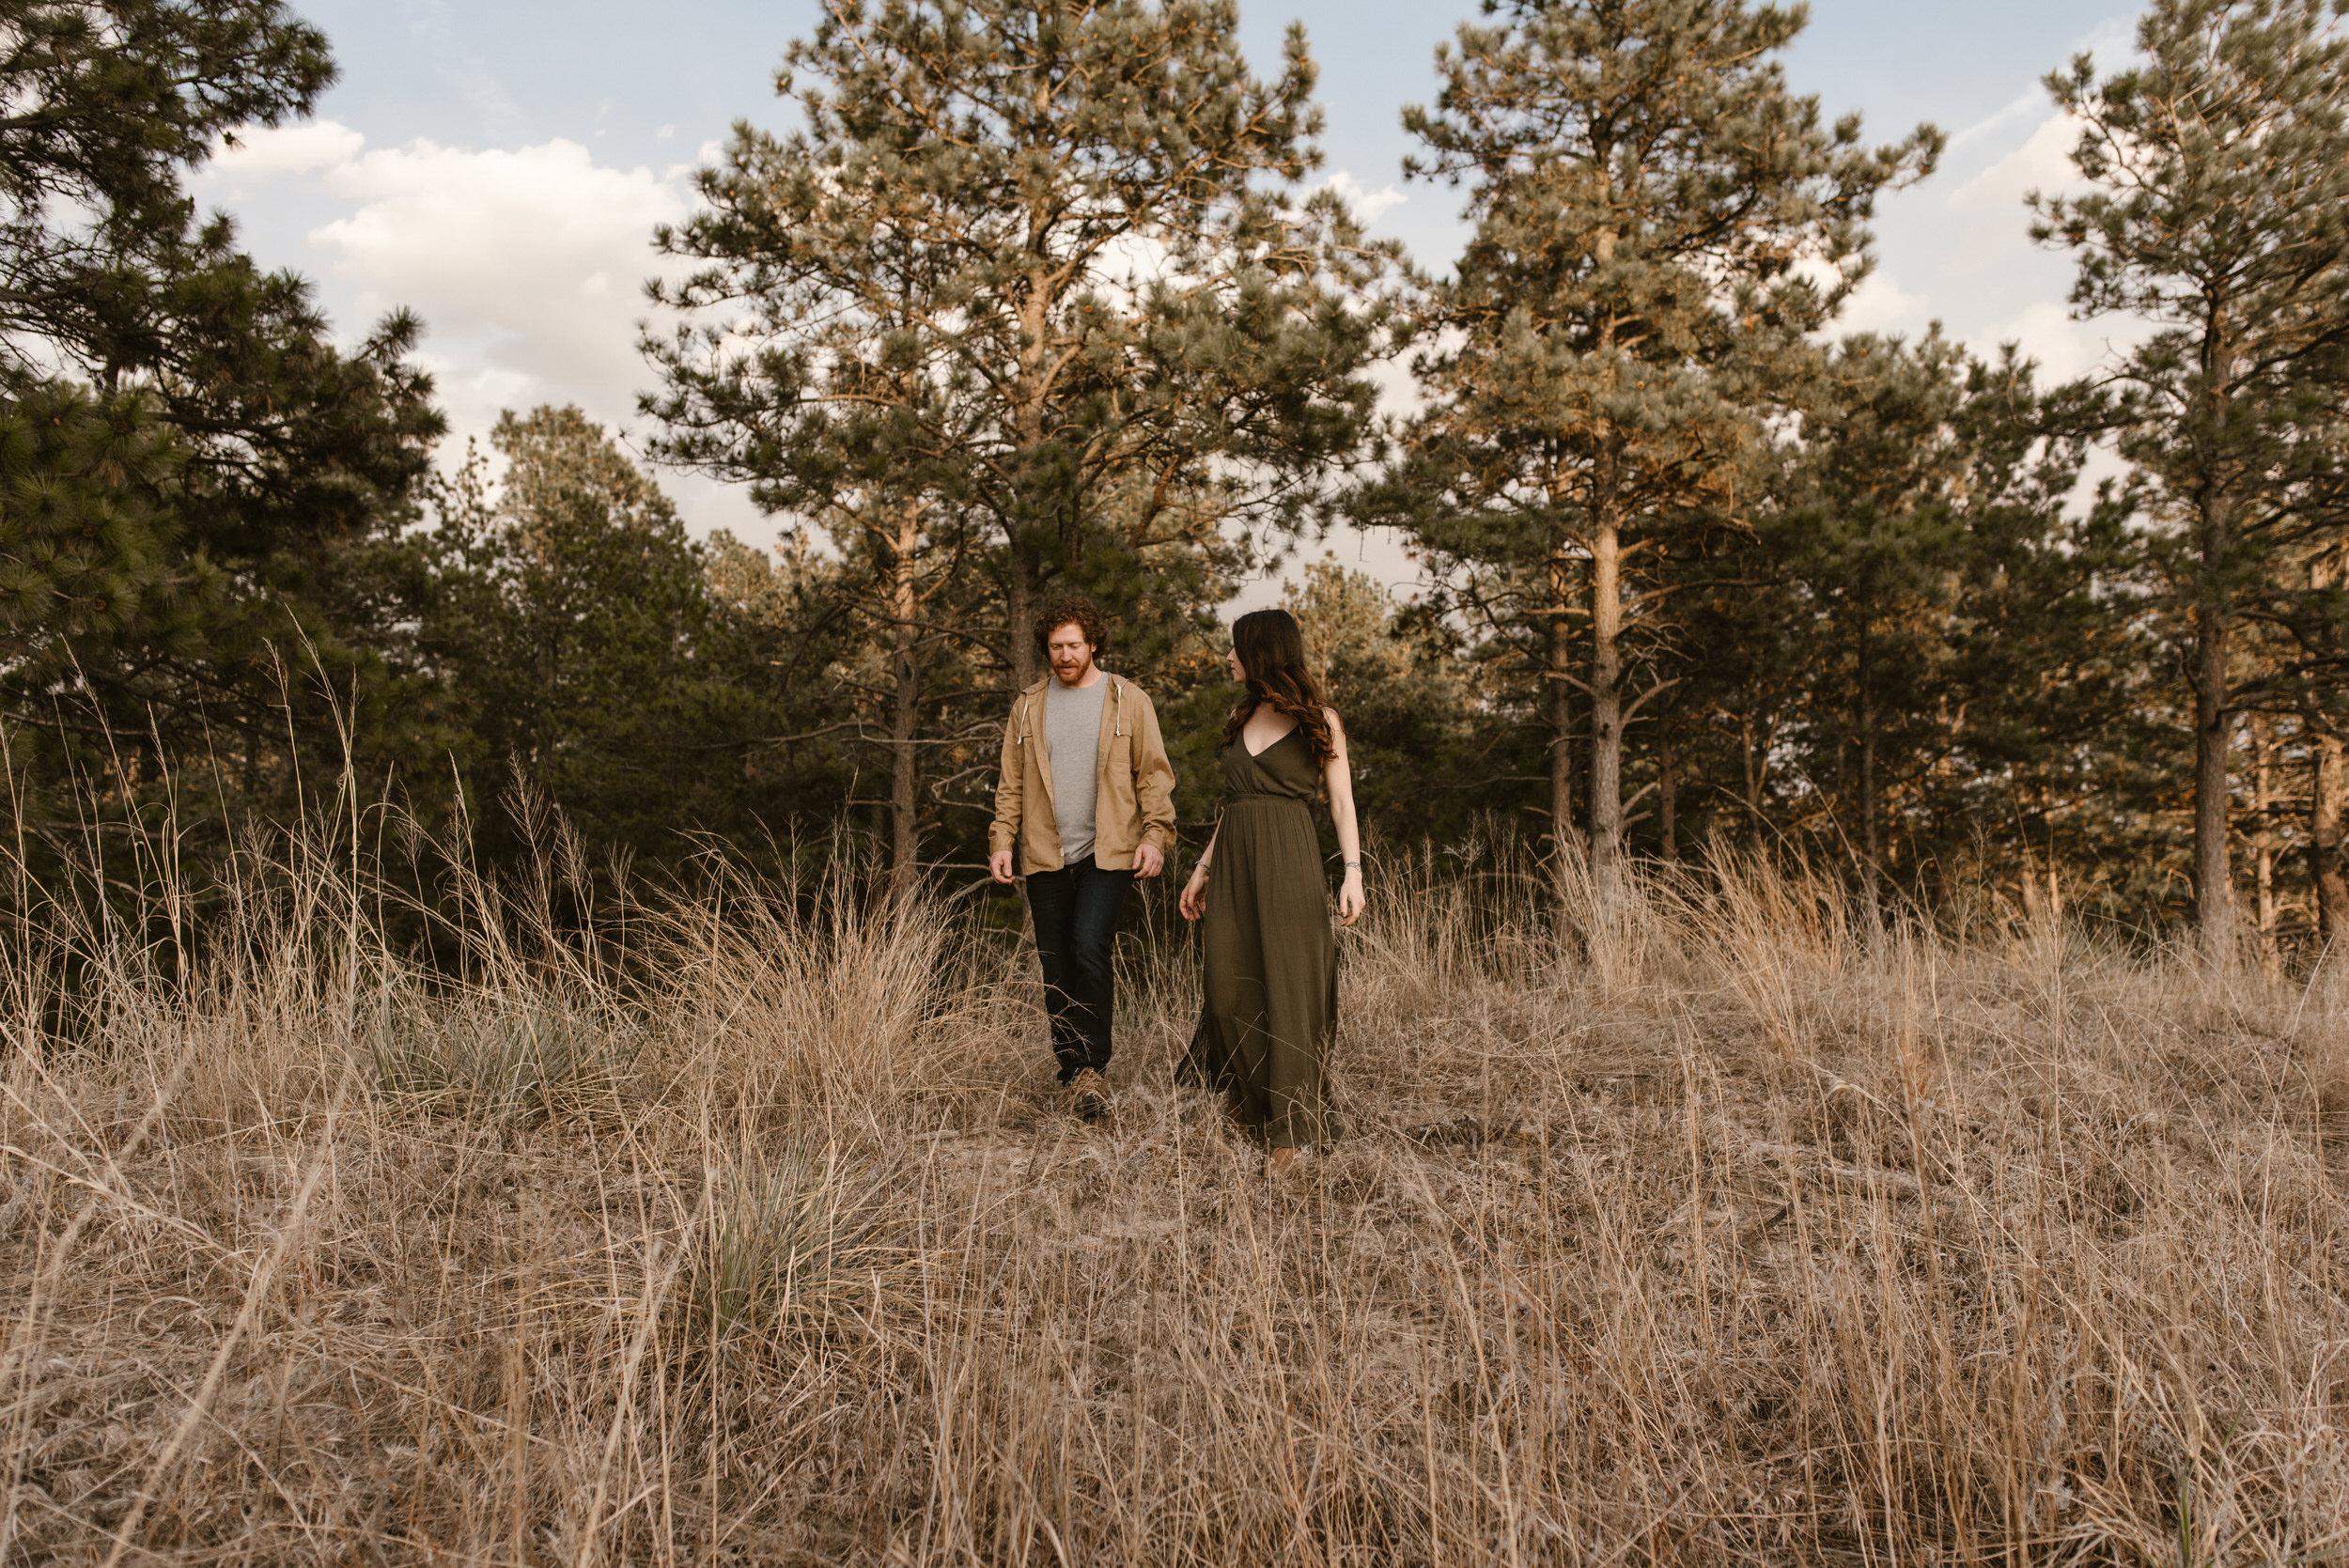 Nebraska-Engagement-Session-Halsey-Forest-Kaylie-Sirek-Photography-054.jpg